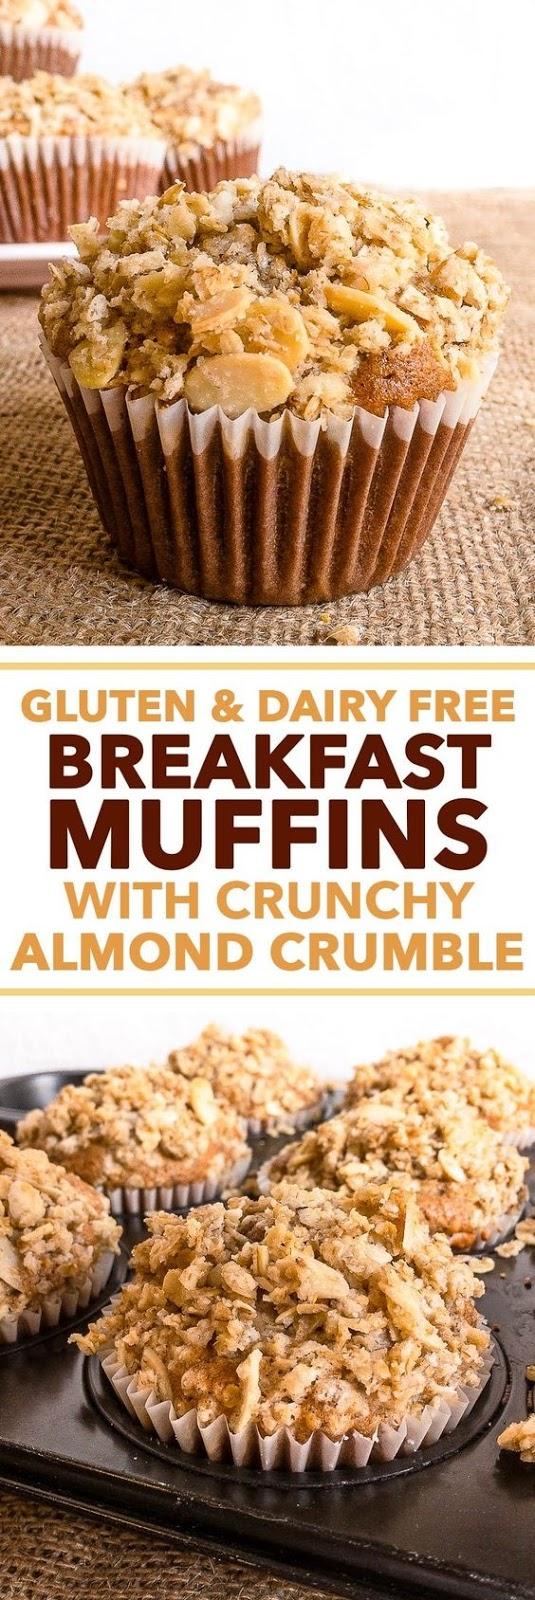 Gluten + Dairy Free Breakfast Muffins with Crunchy Almond Crumble